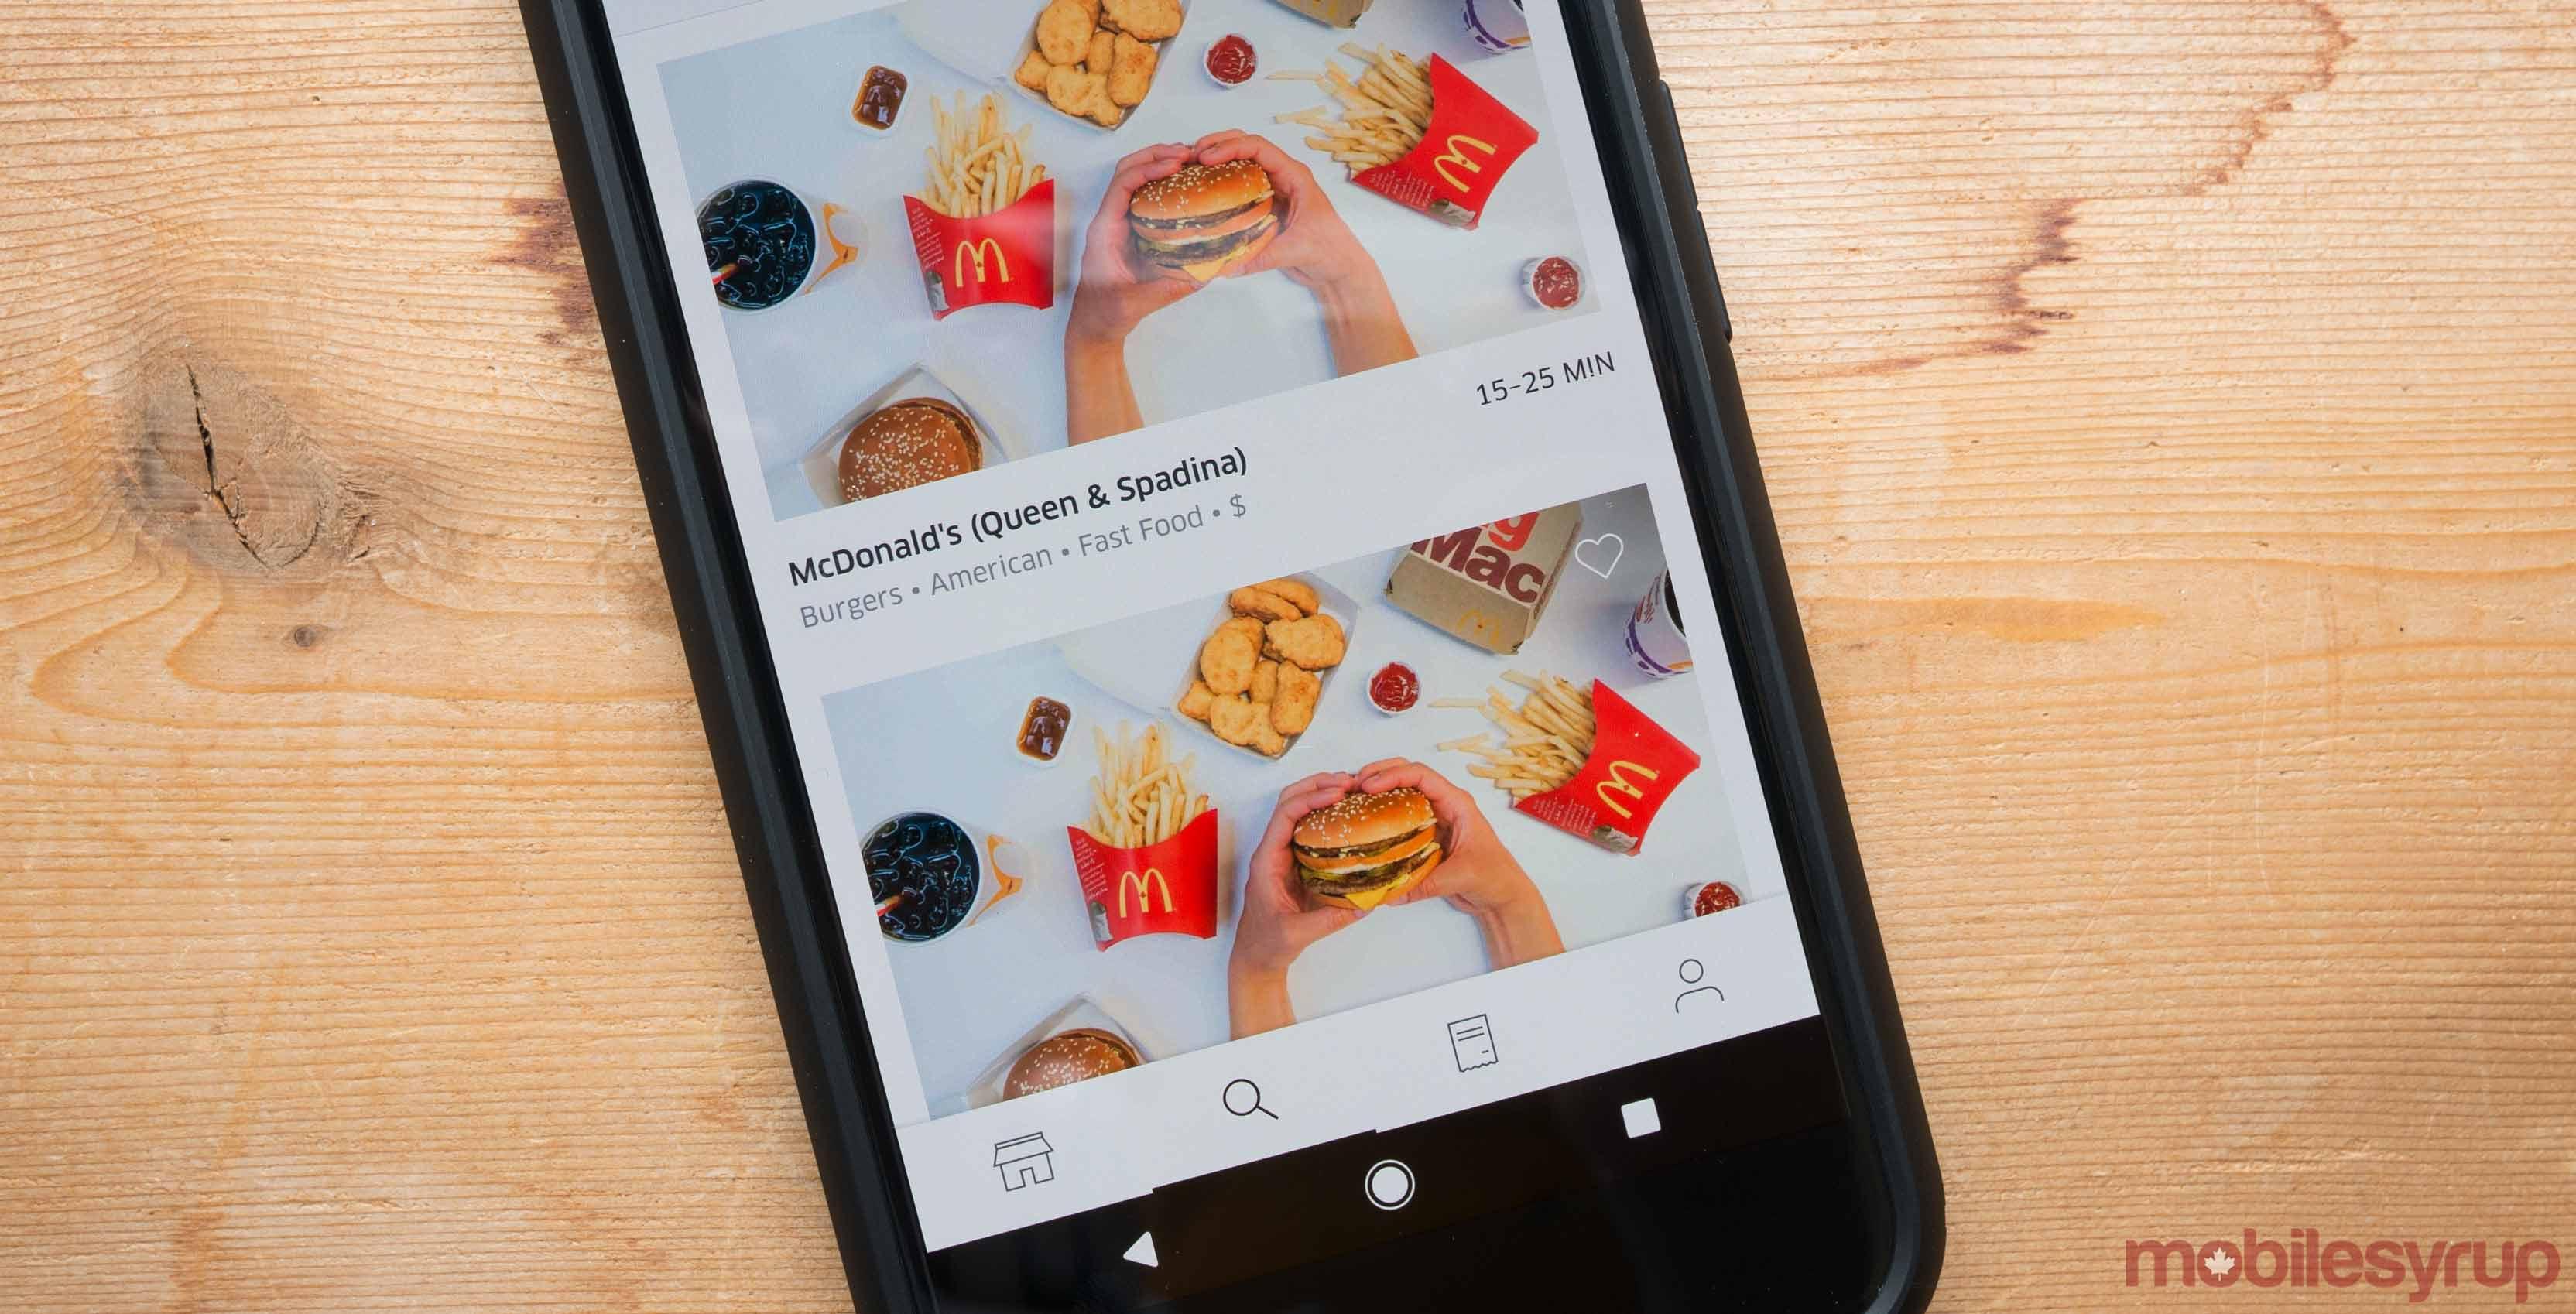 McDonalds UberEATS